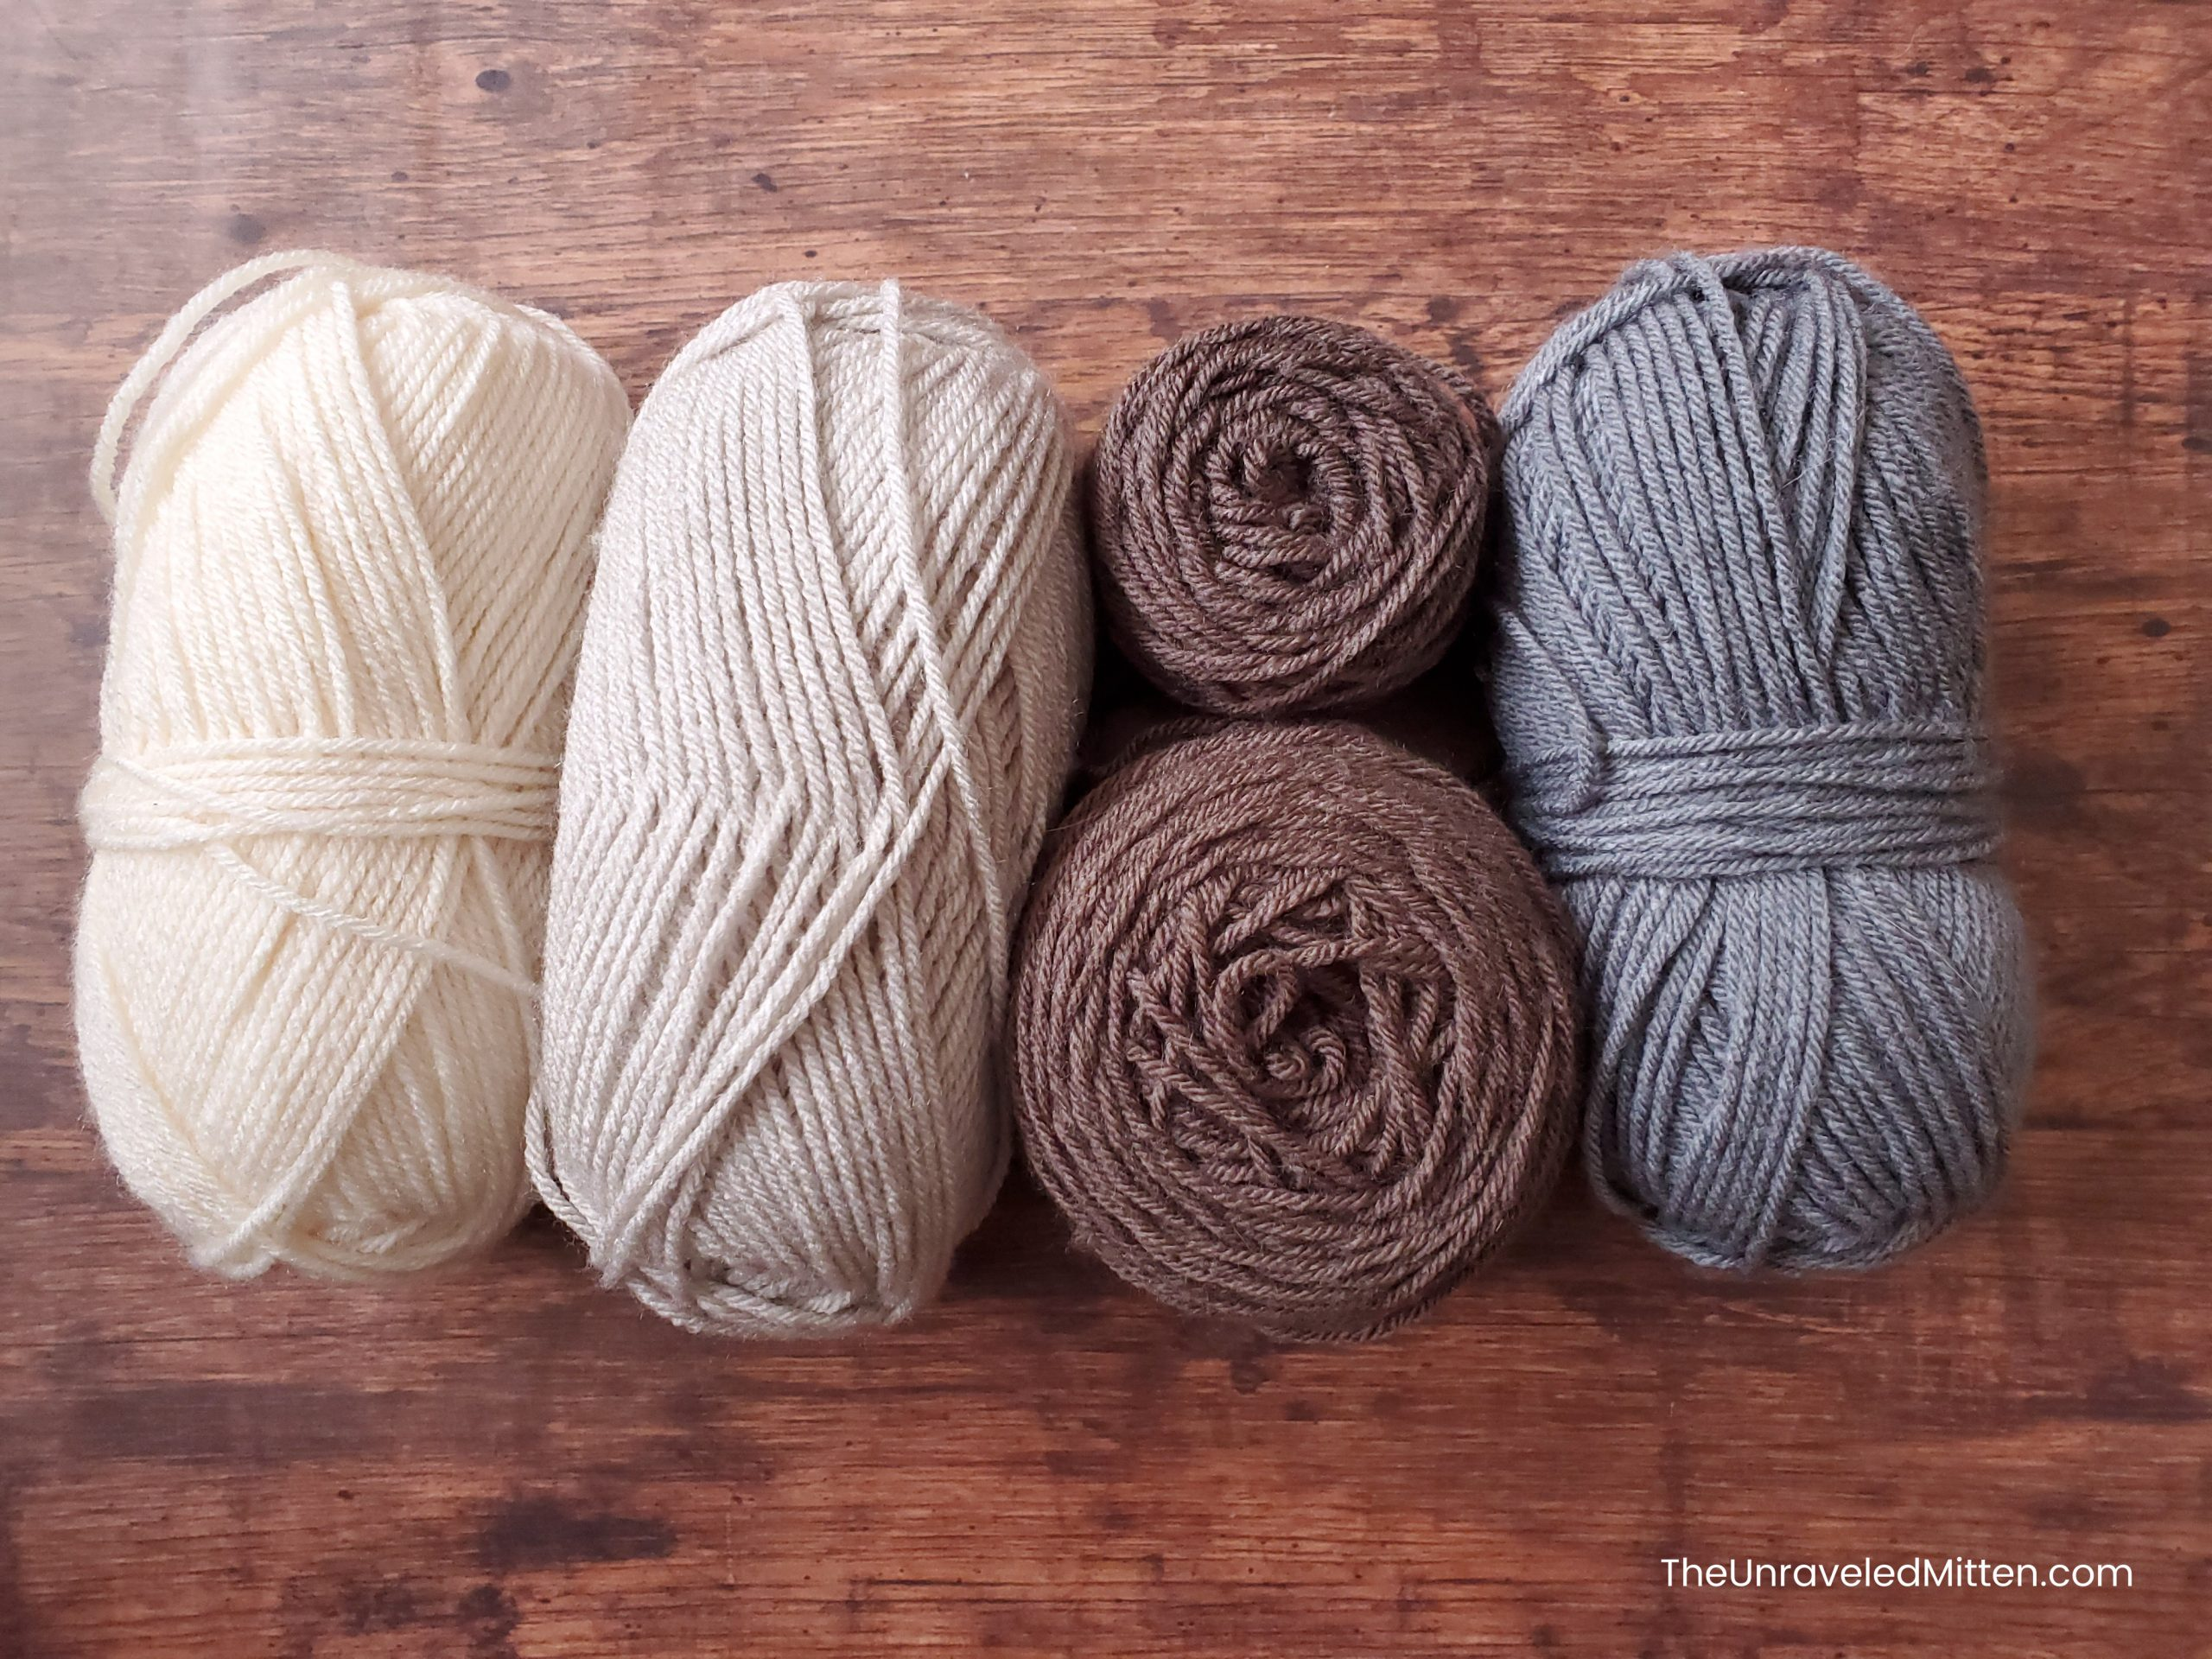 2021 Stash Busting Sampler Afhgan Crochet Along Yarn Colors